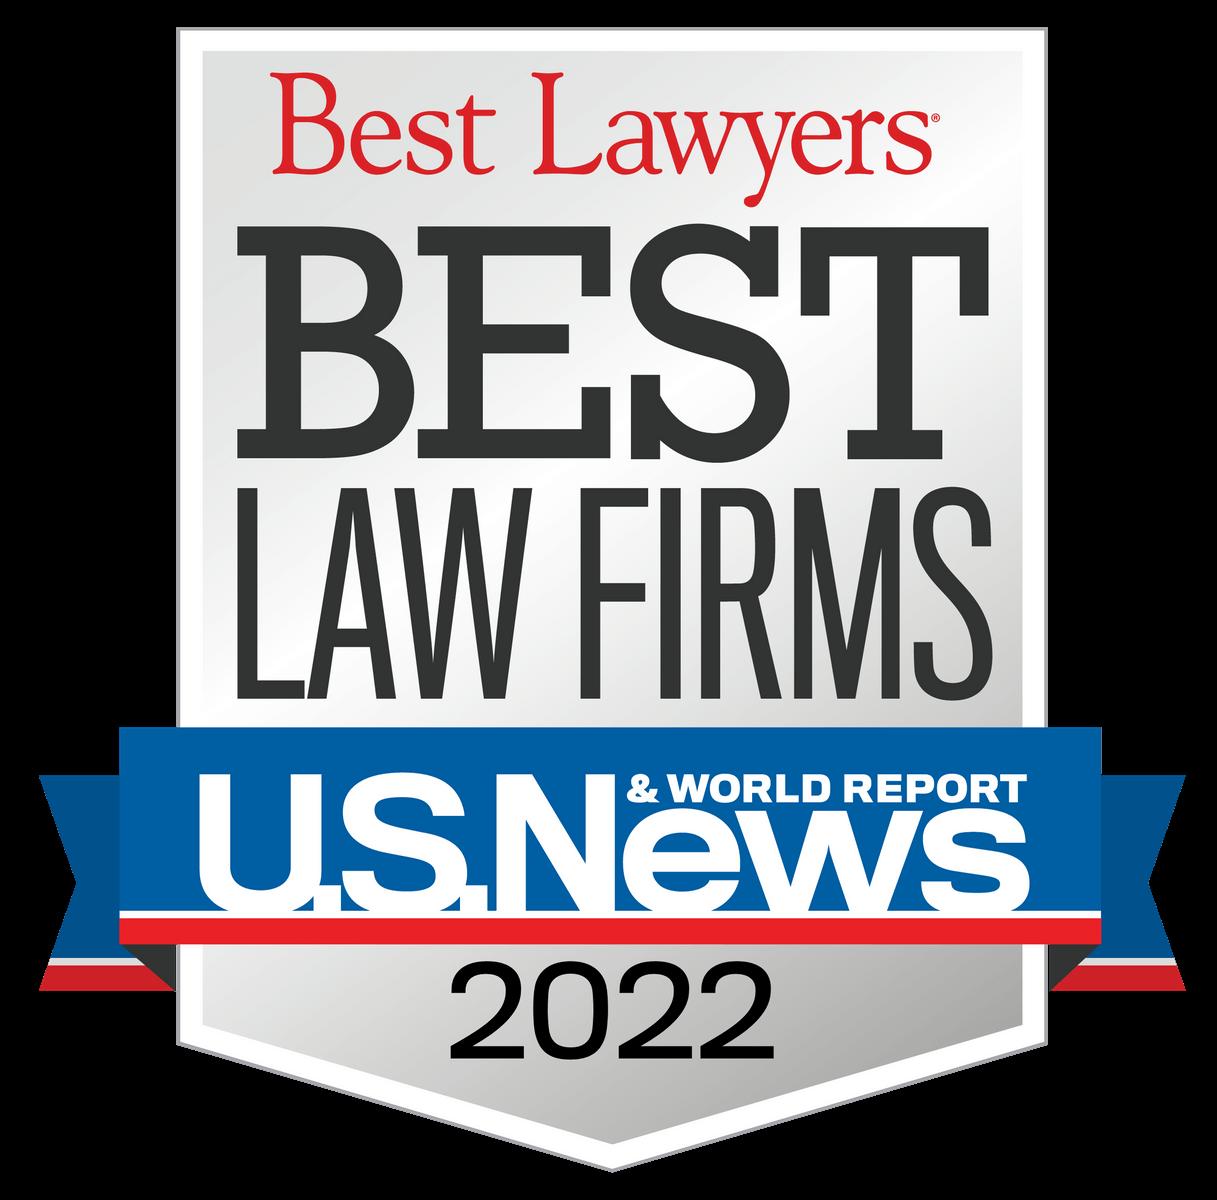 Award Badge - U.S.News Best Law Firms 2020